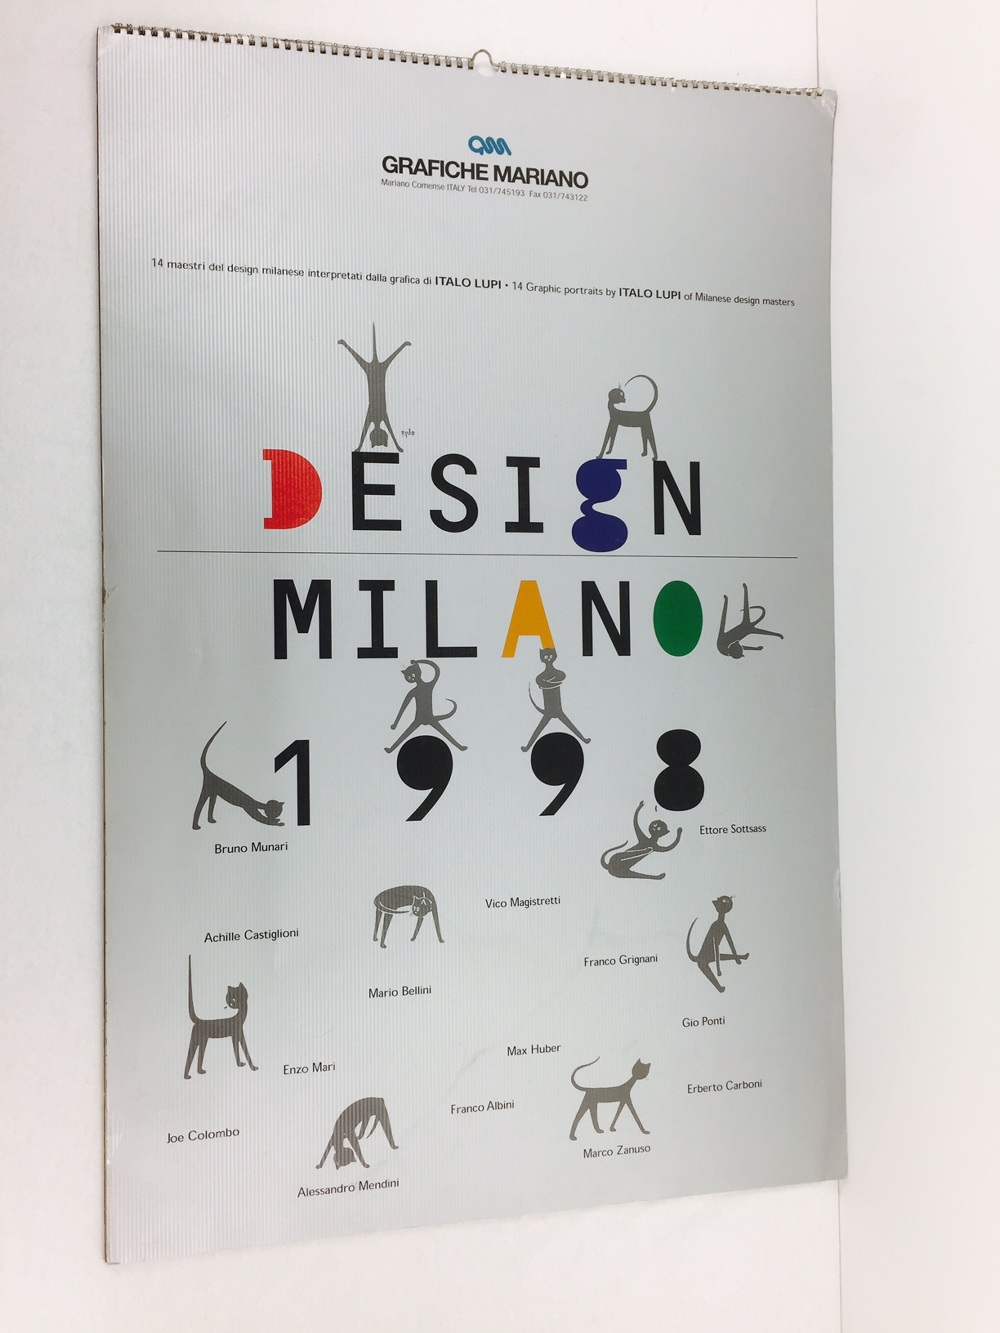 1998 Calendario.Calendario 1998 With Graphics Design By Most Famous Italian